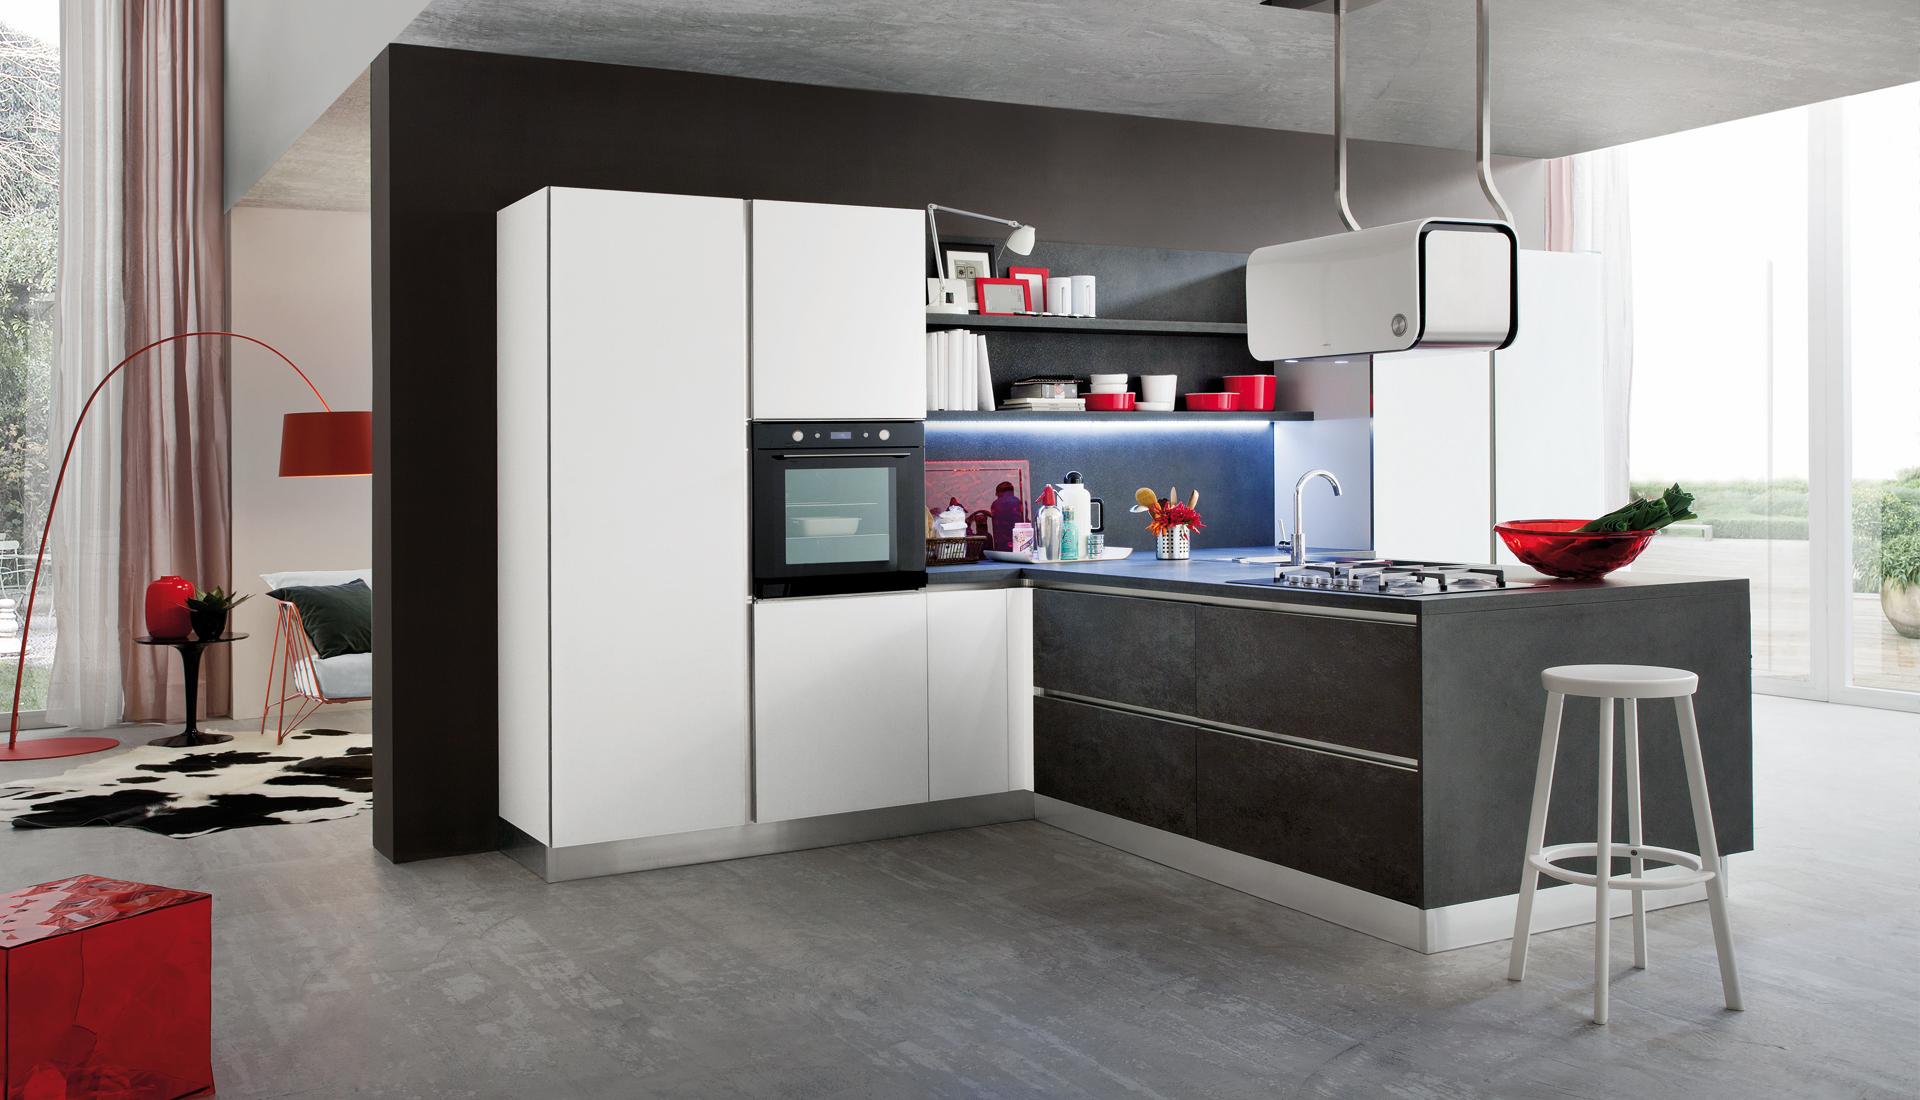 Foto cucina moderna myglass by gicinque arredamento for Arredamento cucina moderna foto